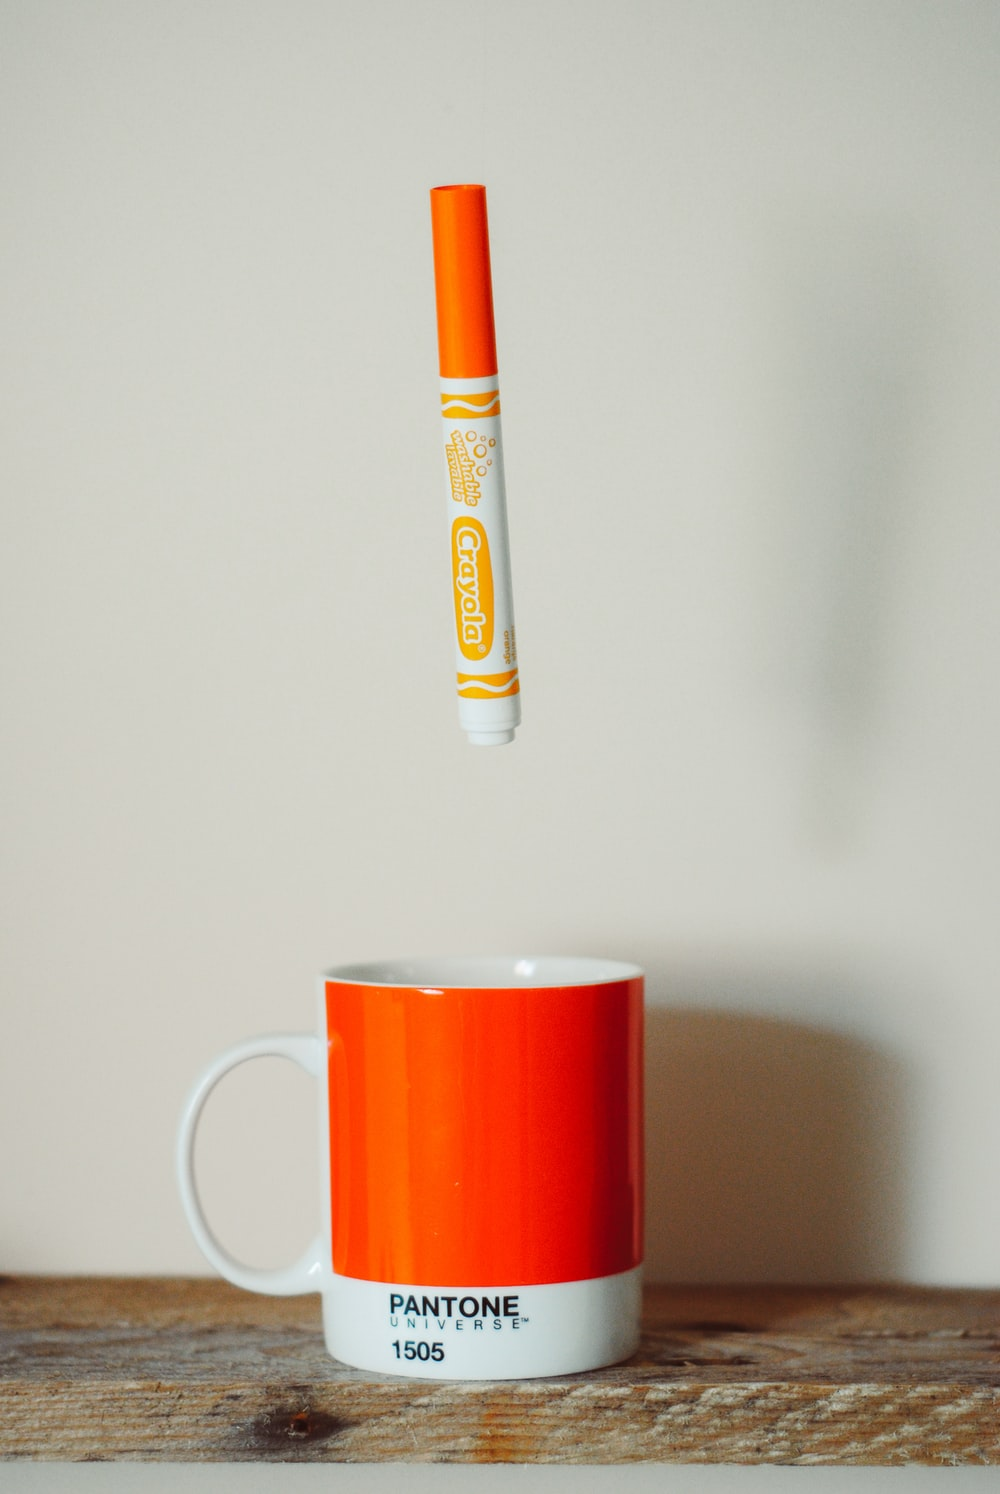 orange Crayola crayon pen above mug